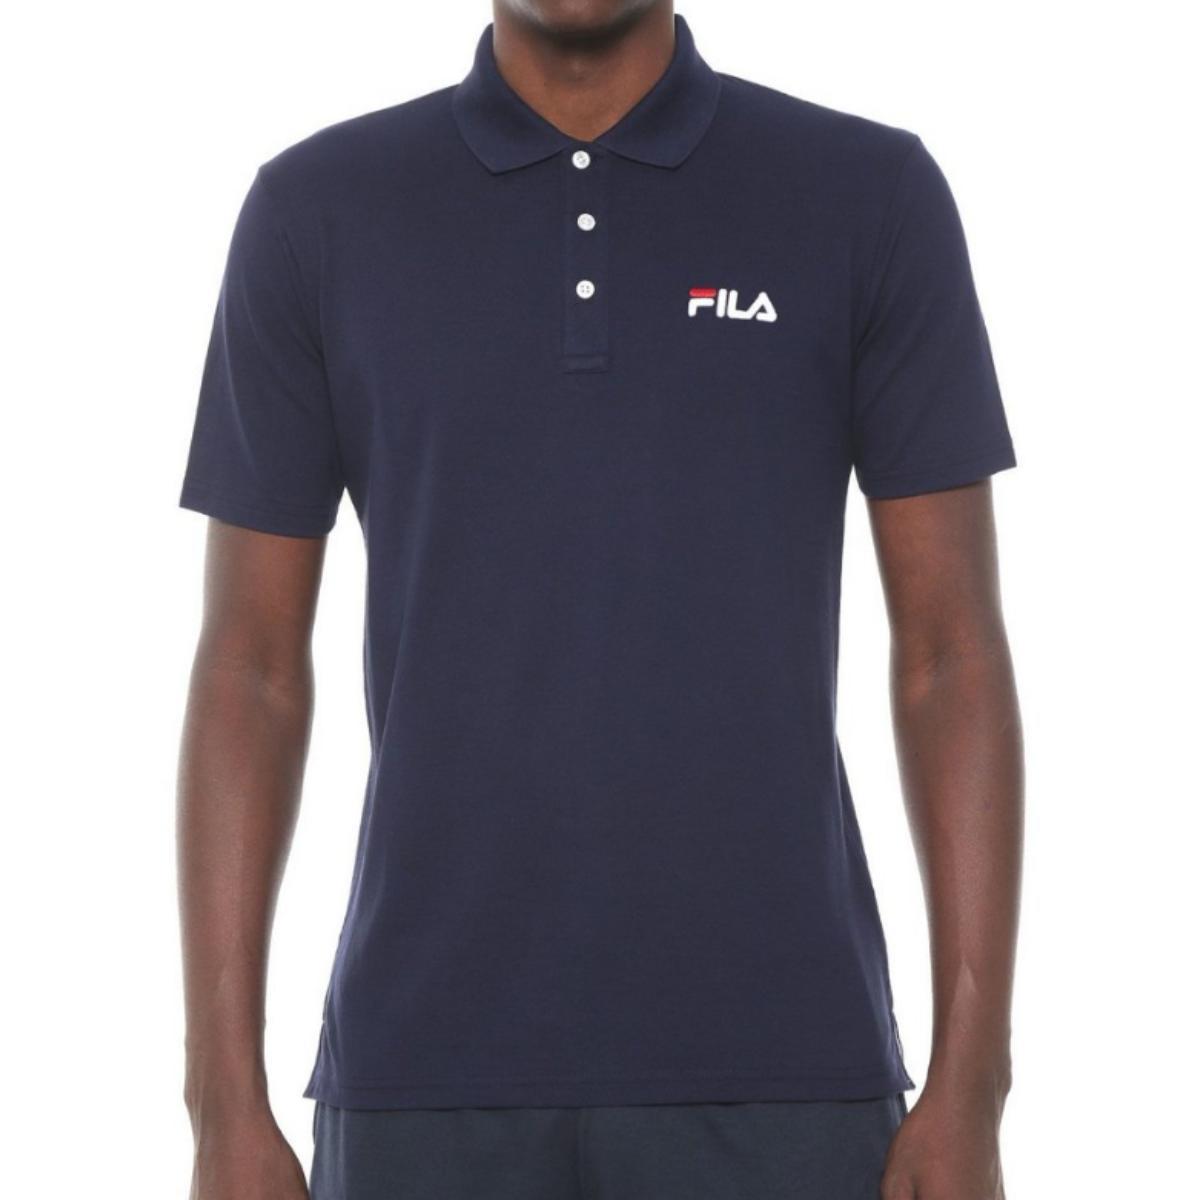 Camiseta Masculina Fila Ls360192.140 Select Marinho